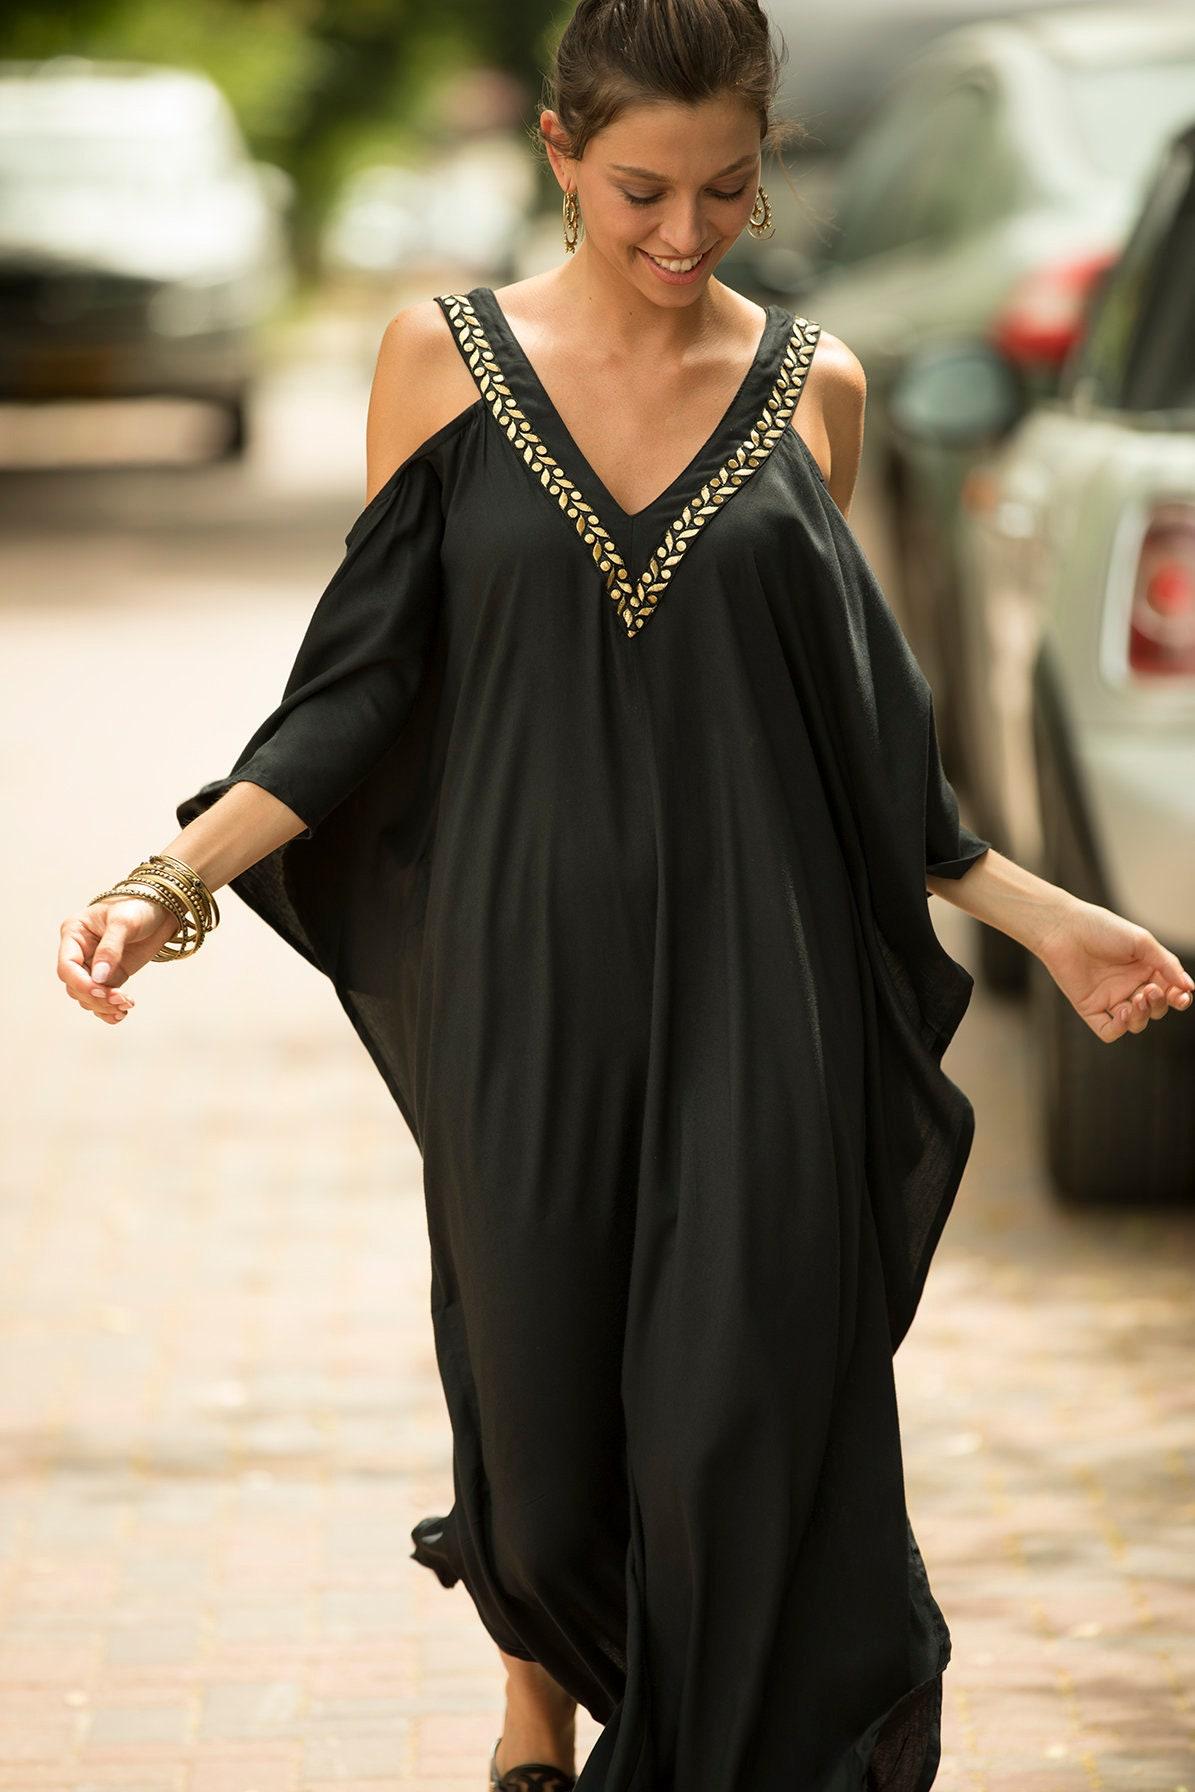 f939b4cc2563 Black and Gold Caftan Summer Dress Women Oversized Maxi | Etsy